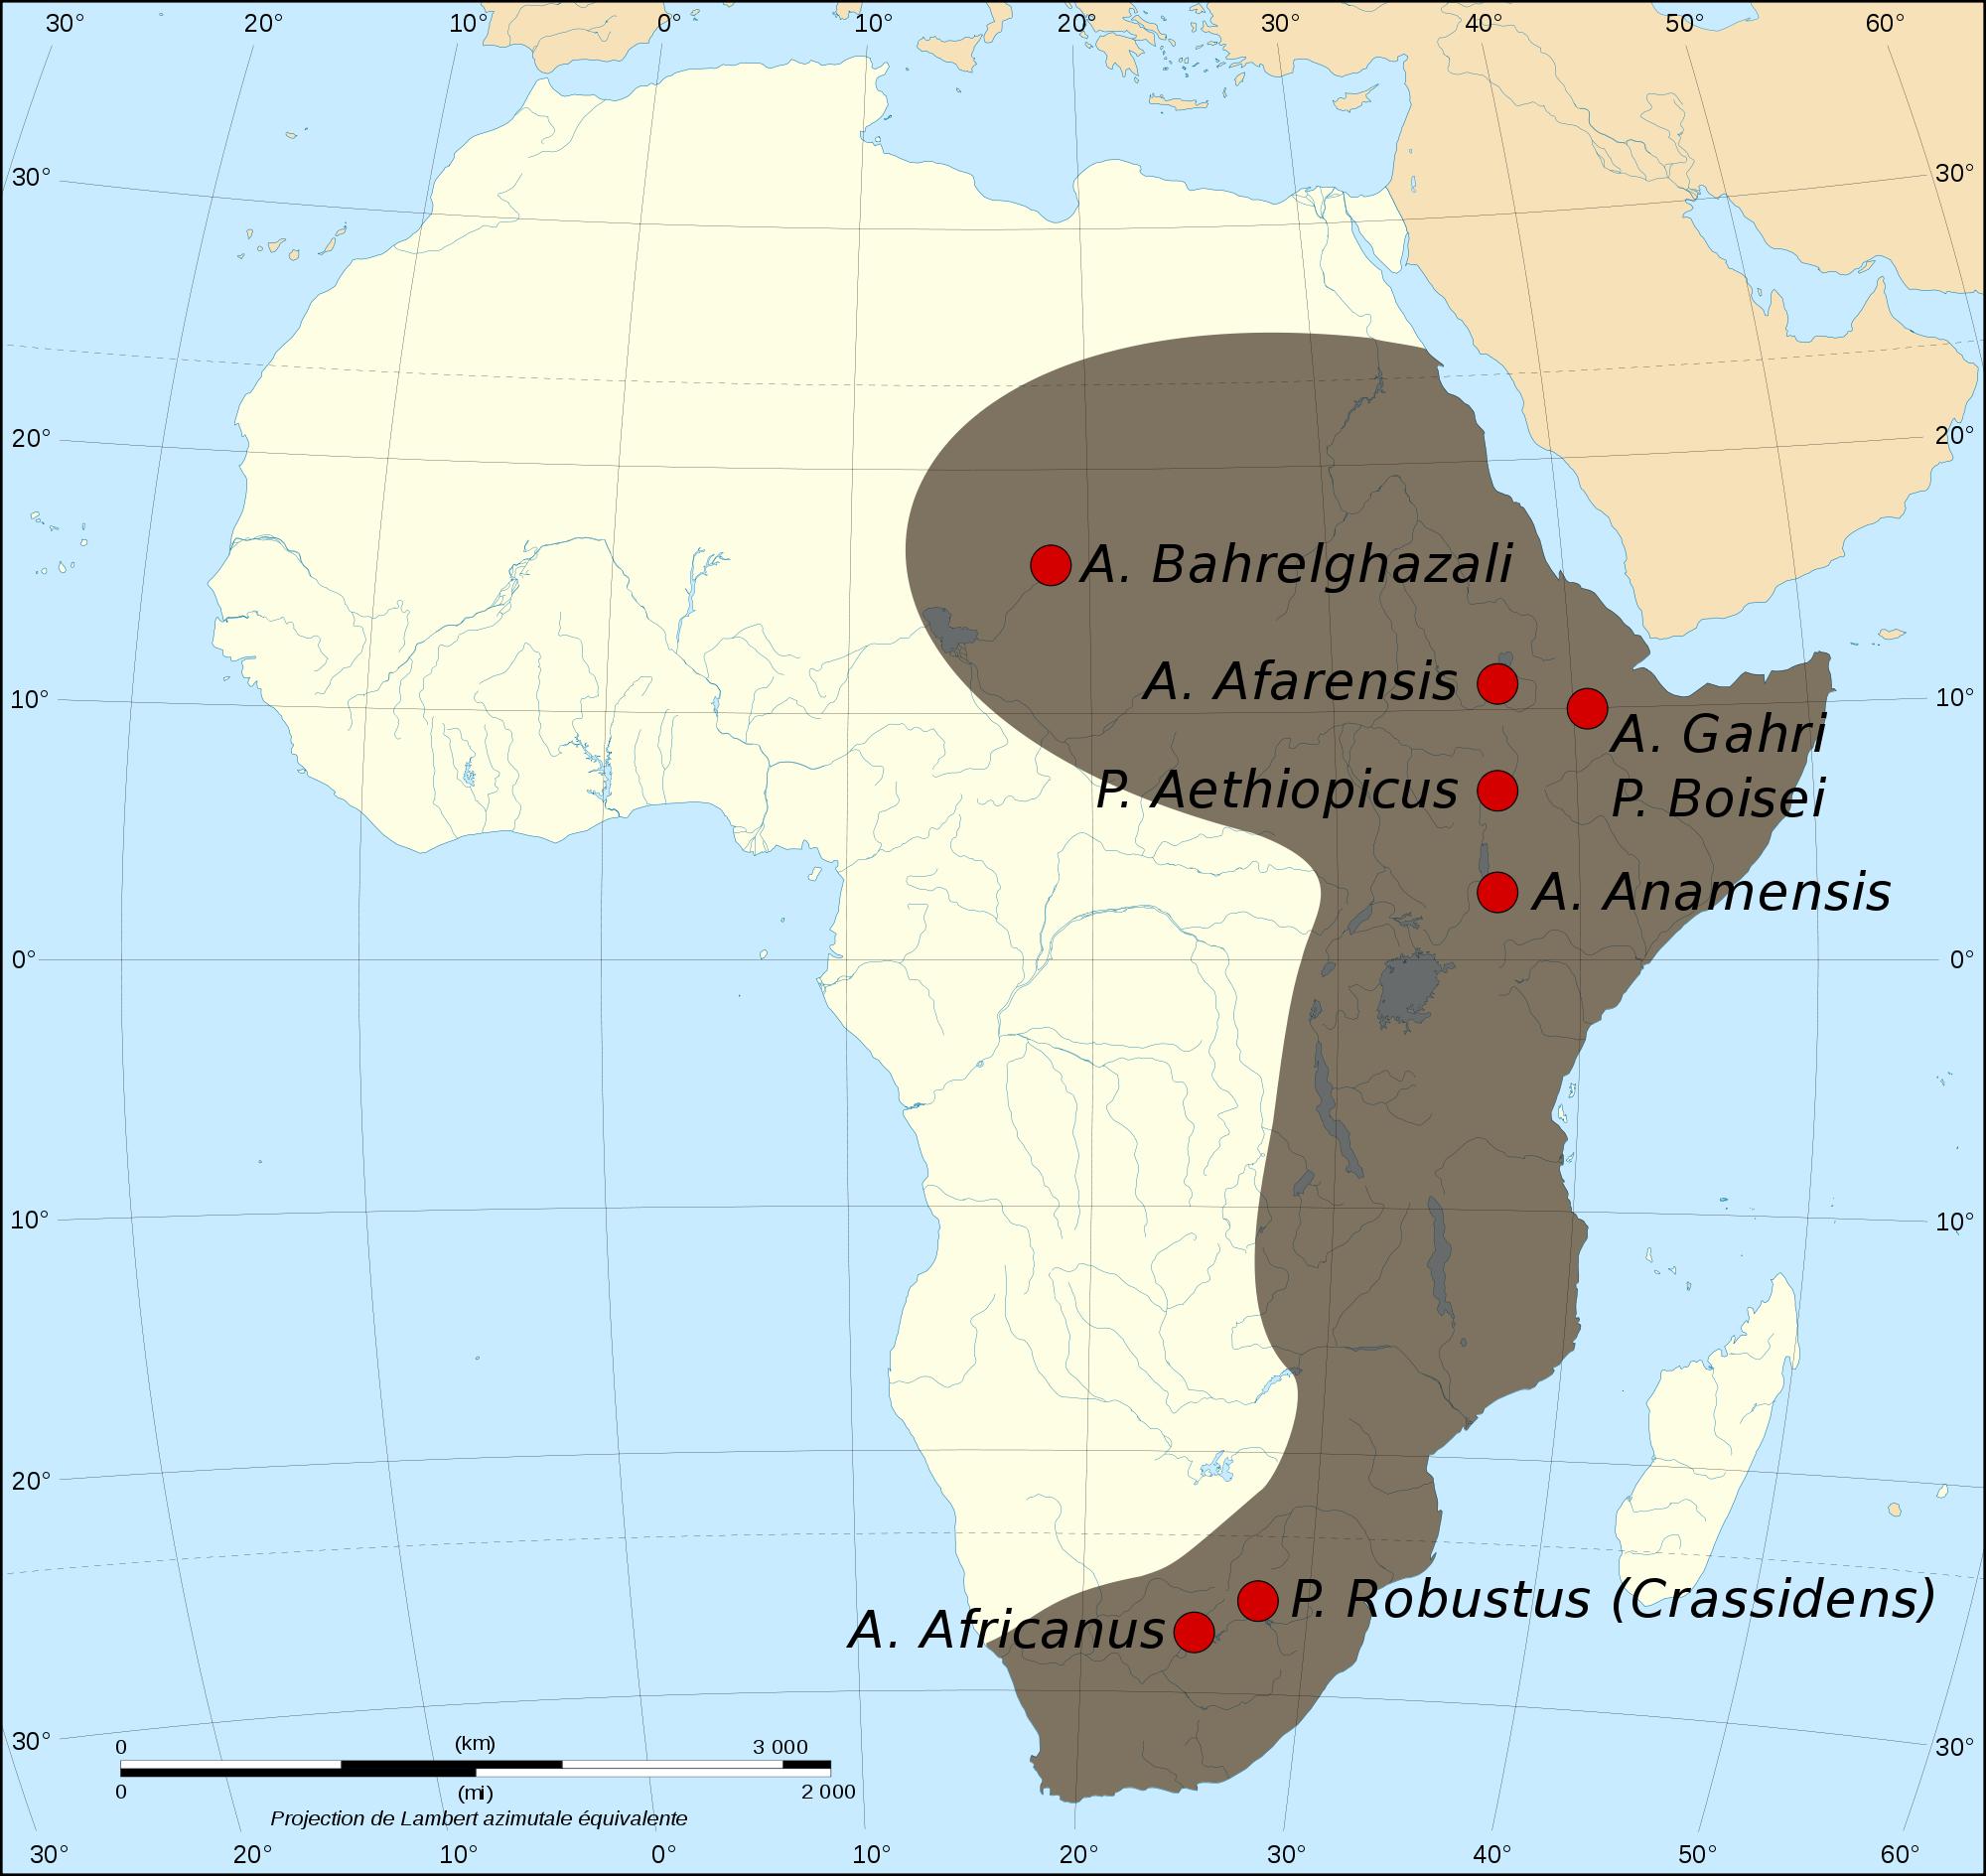 Australopithecine in Africa